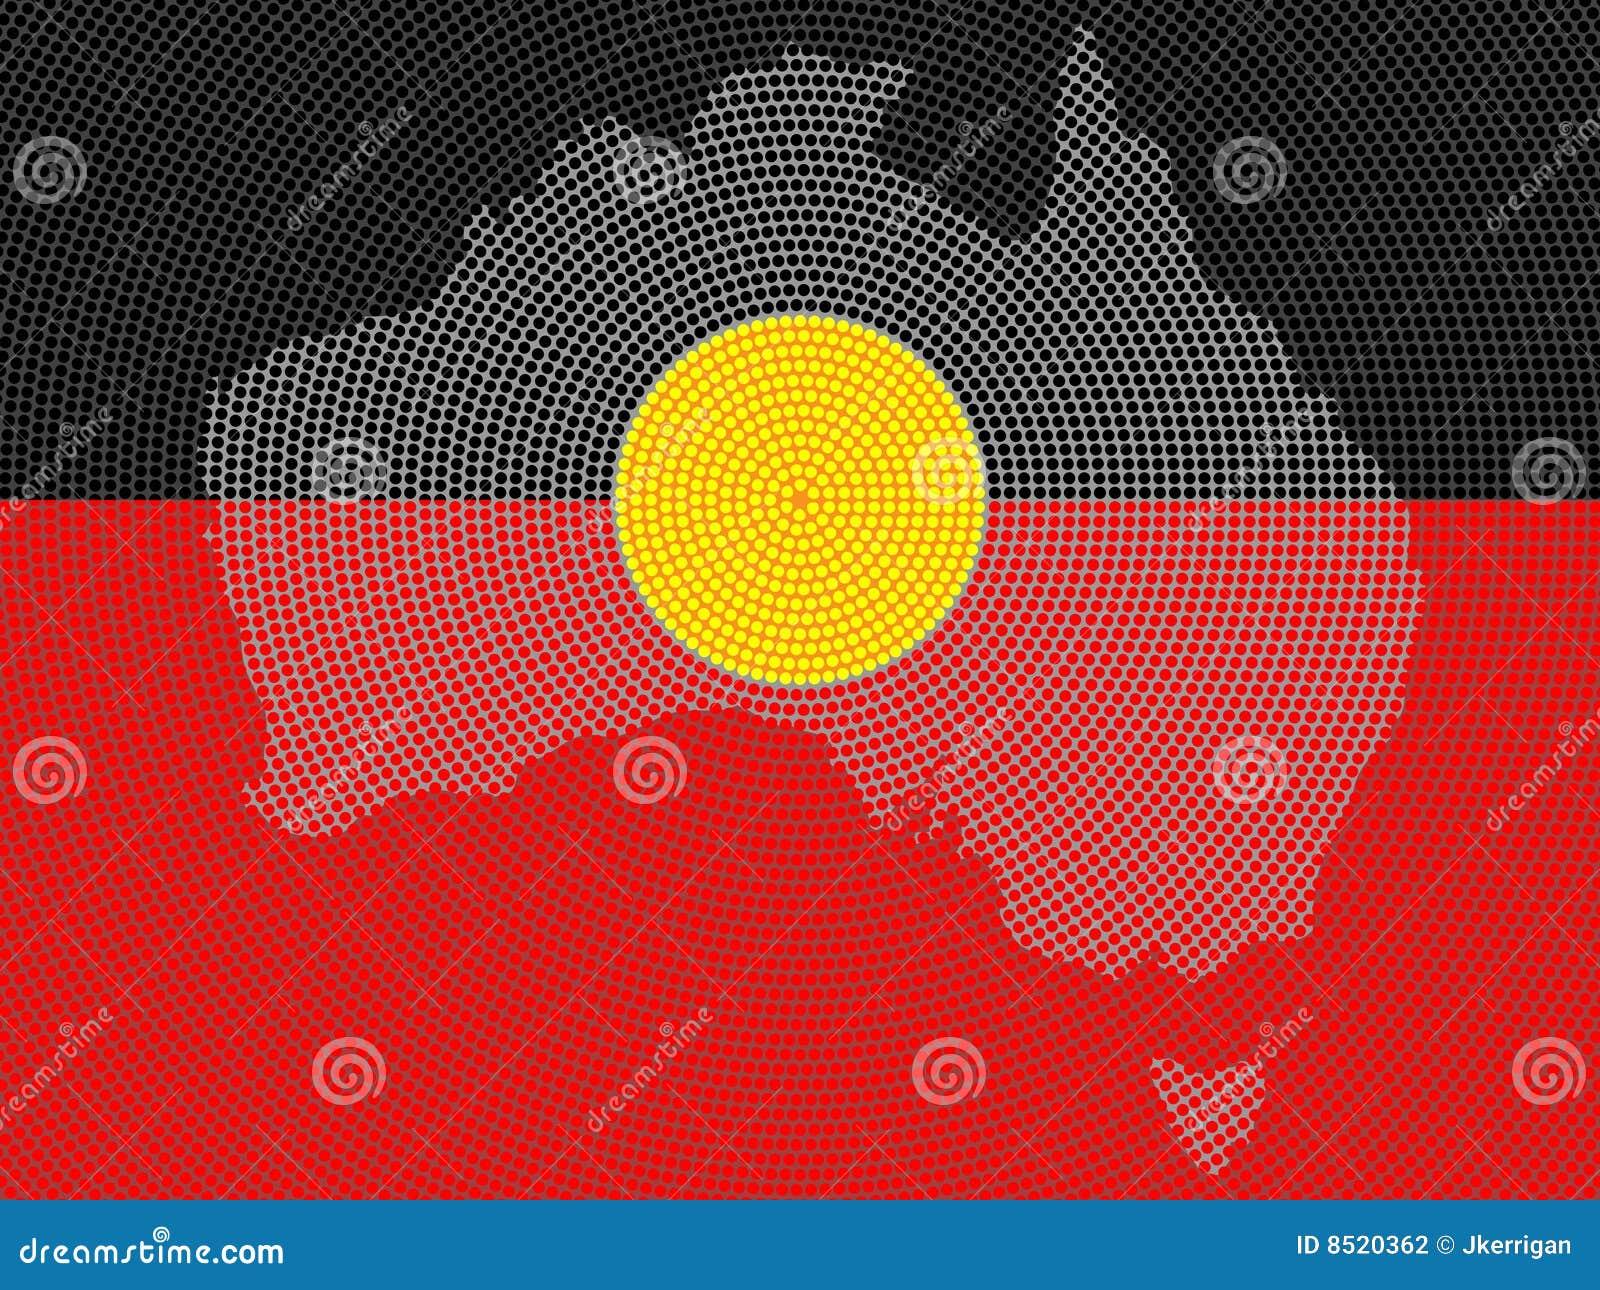 Aboriginal Flag Design Stock Vector Illustration Of Country 8520362